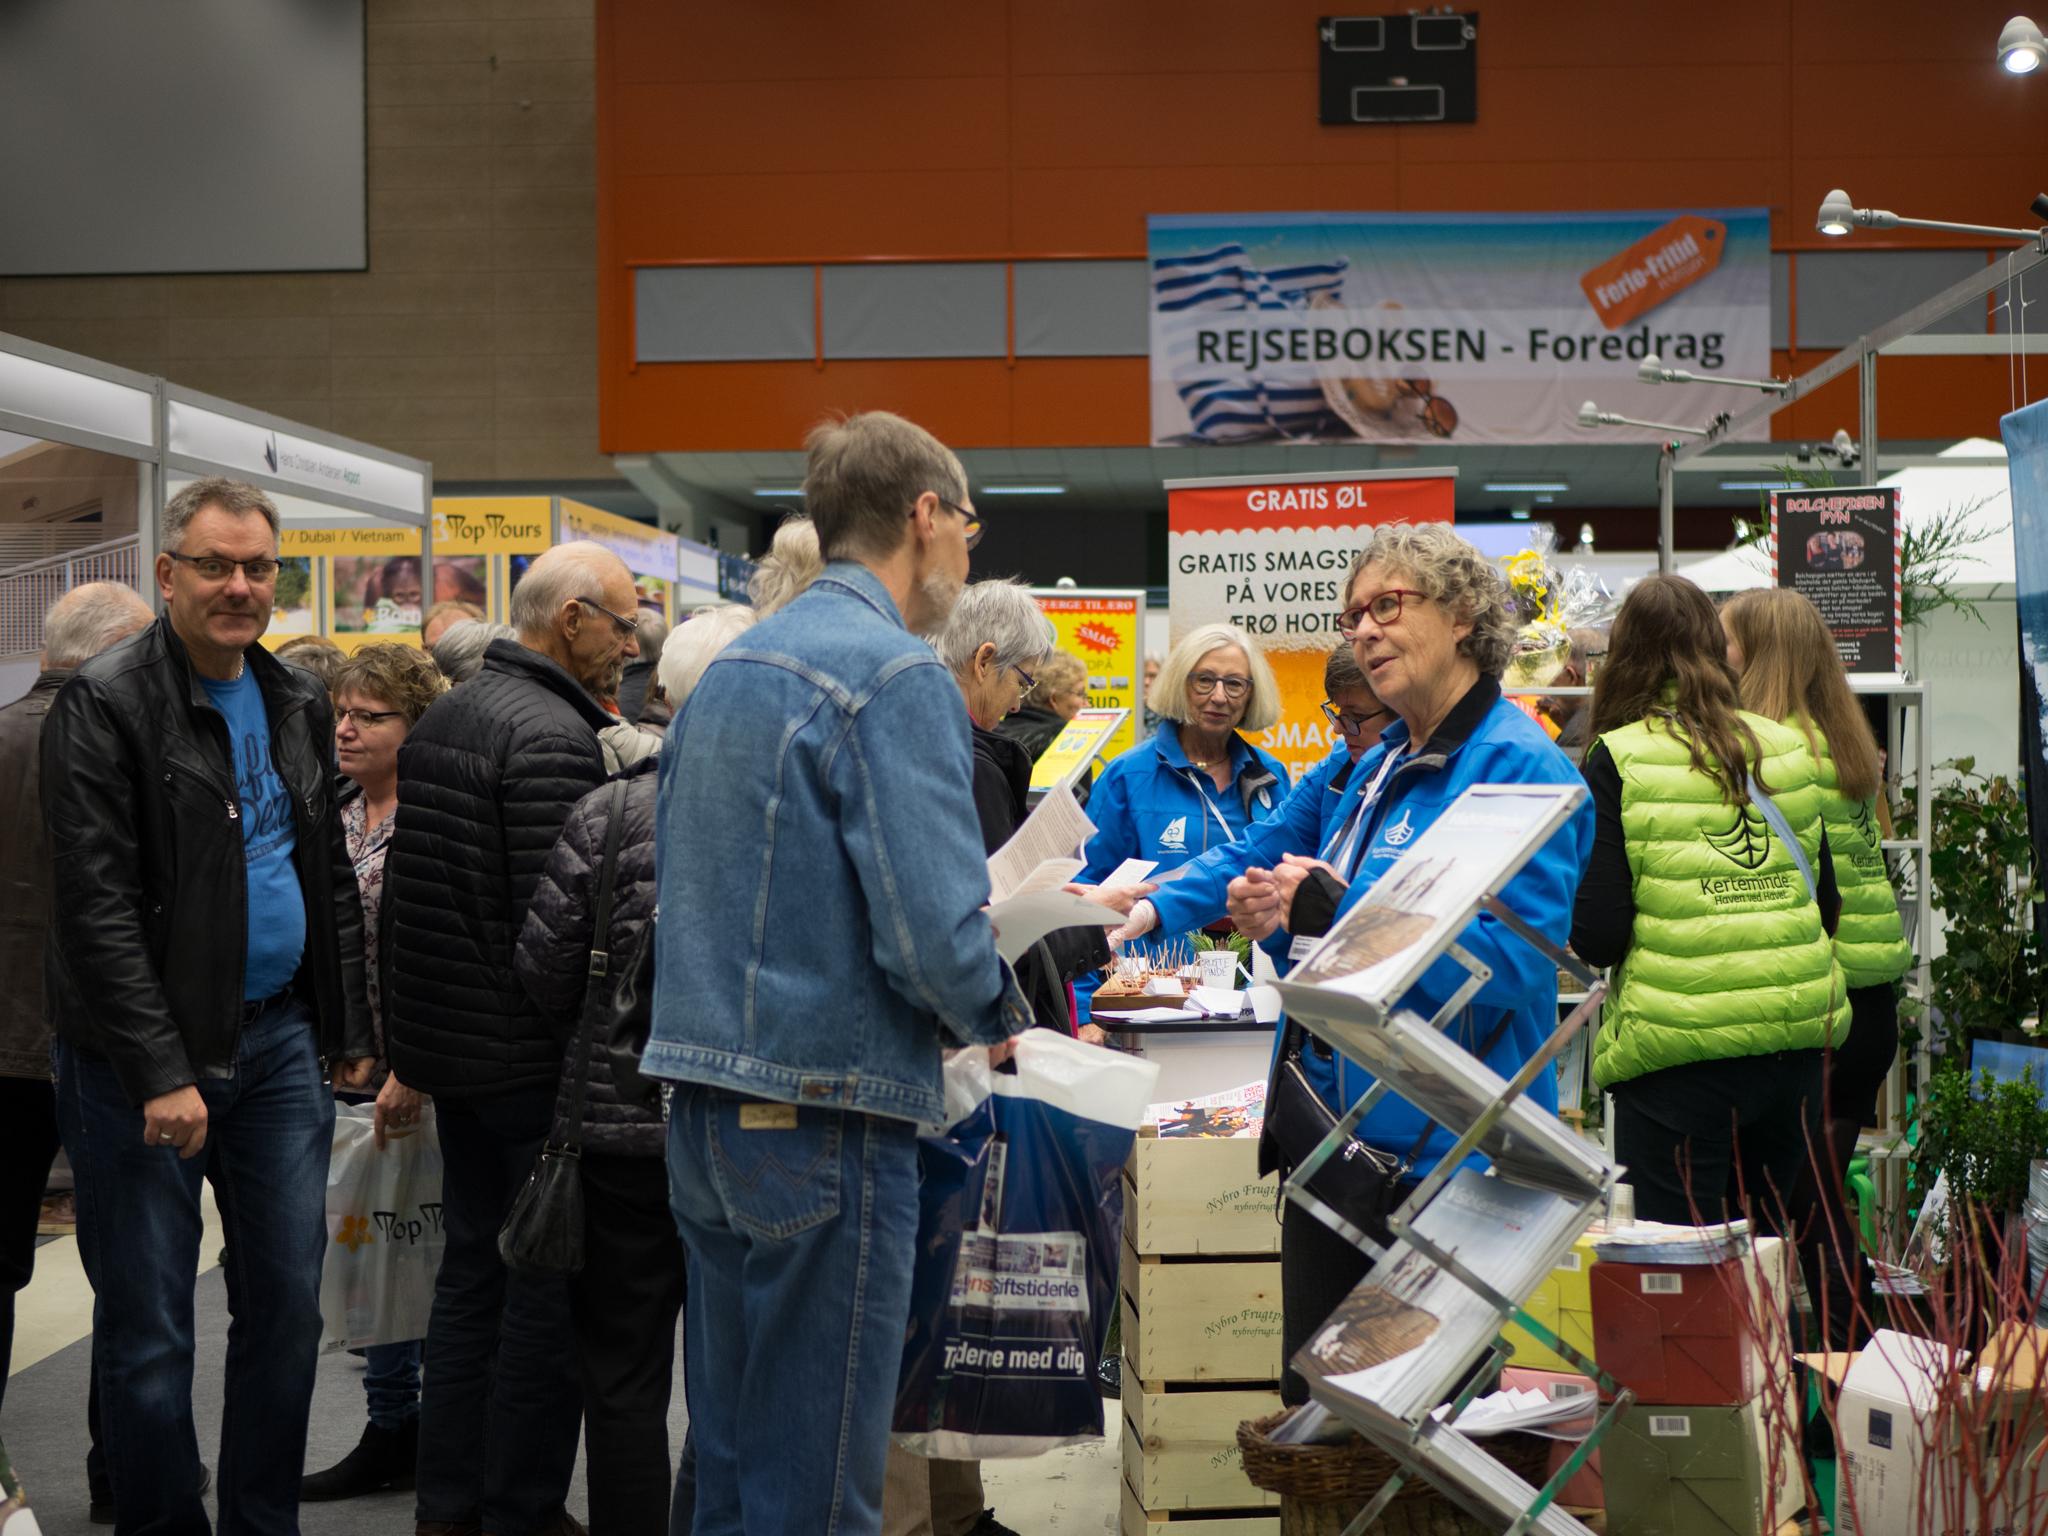 Arkivfoto fra en Ferie-Fritidmesse i Odense Congress Center. Foto: Hans Kristian Hannibal-Bach, Odense Congress Center.